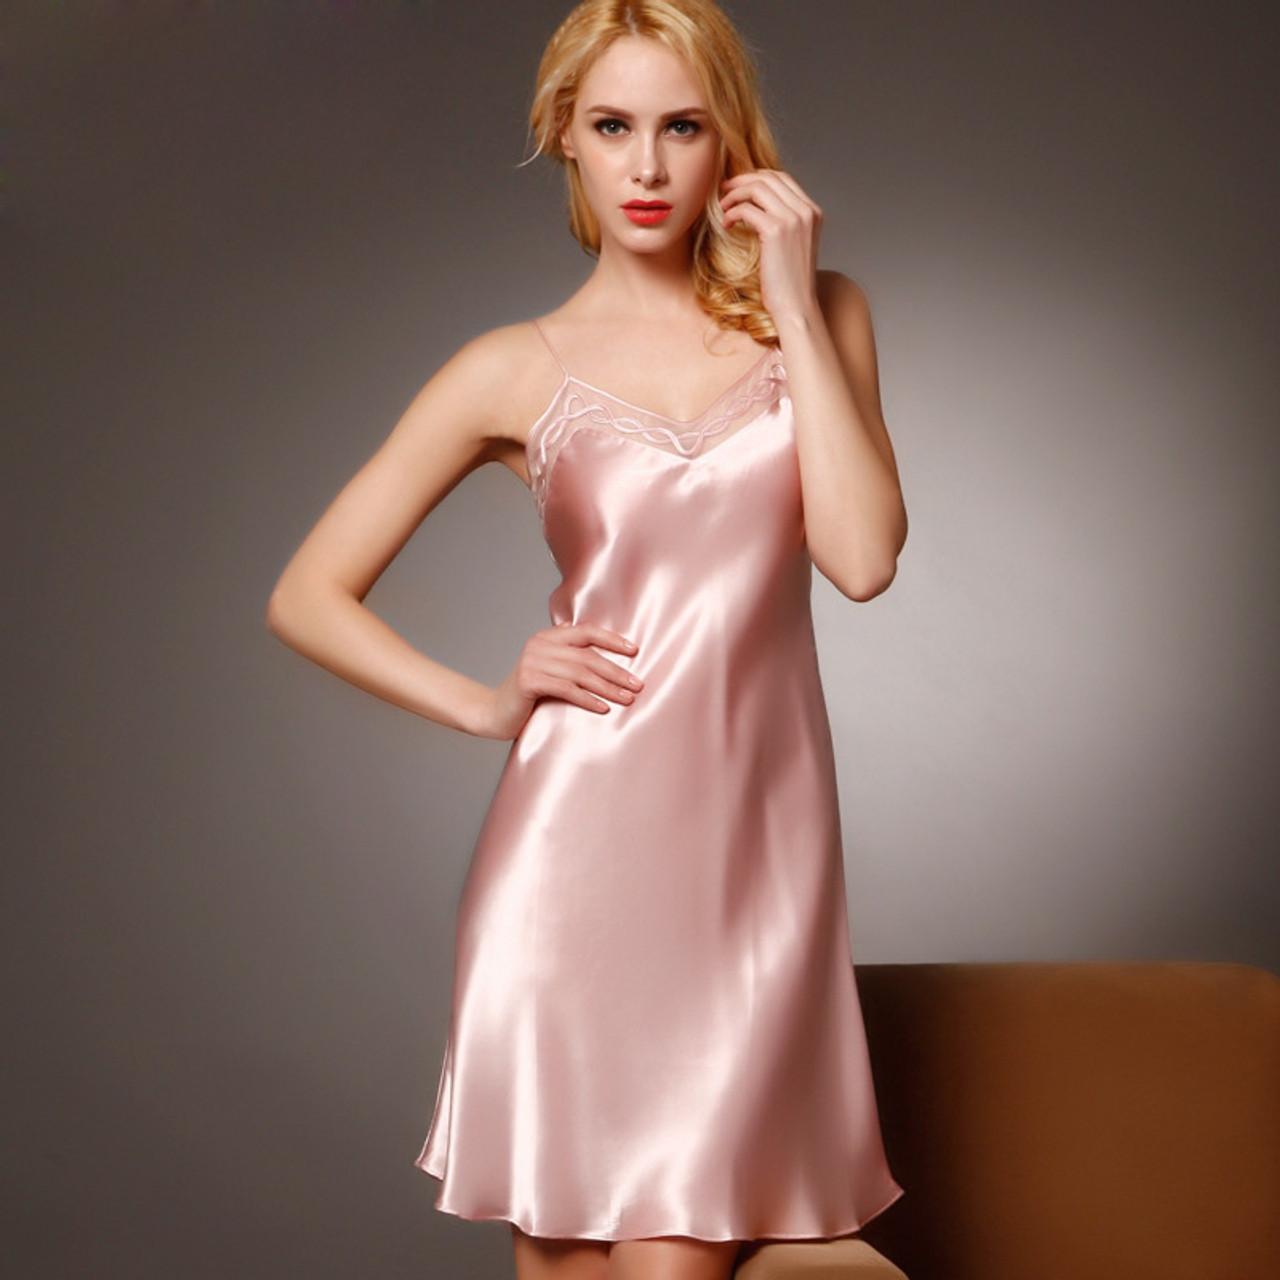 100% Silk Nightgowns Women Sexy Sleepwear Dresses Silk Nightdress Lady  Summer Style Dress Pink Loungewear Clothes - OnshopDeals.Com ad99bdc2f8